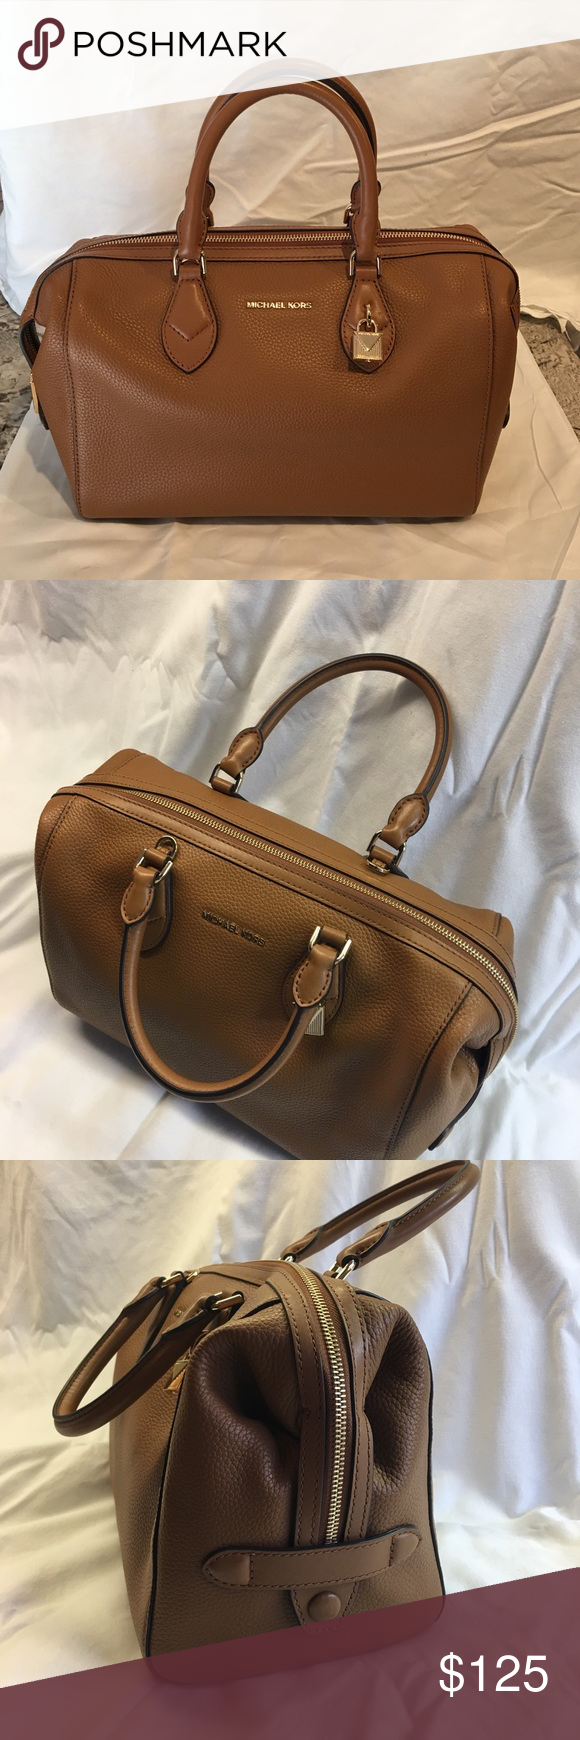 04734da7389221 Michael Kors Duffle Handbag Authentic MK Duffle w/strap -Medium in Khaki  Measurements: